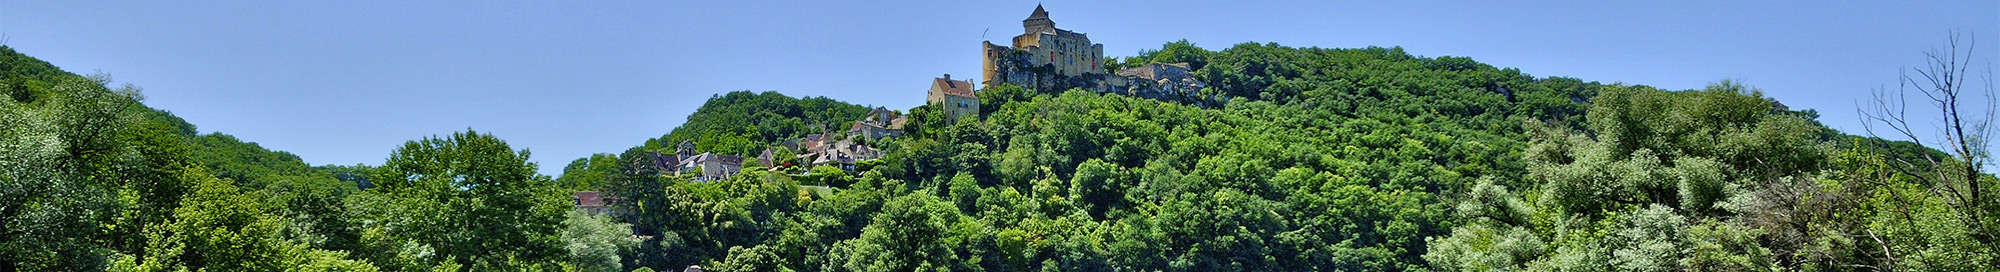 Week-end et séjour en Dordogne